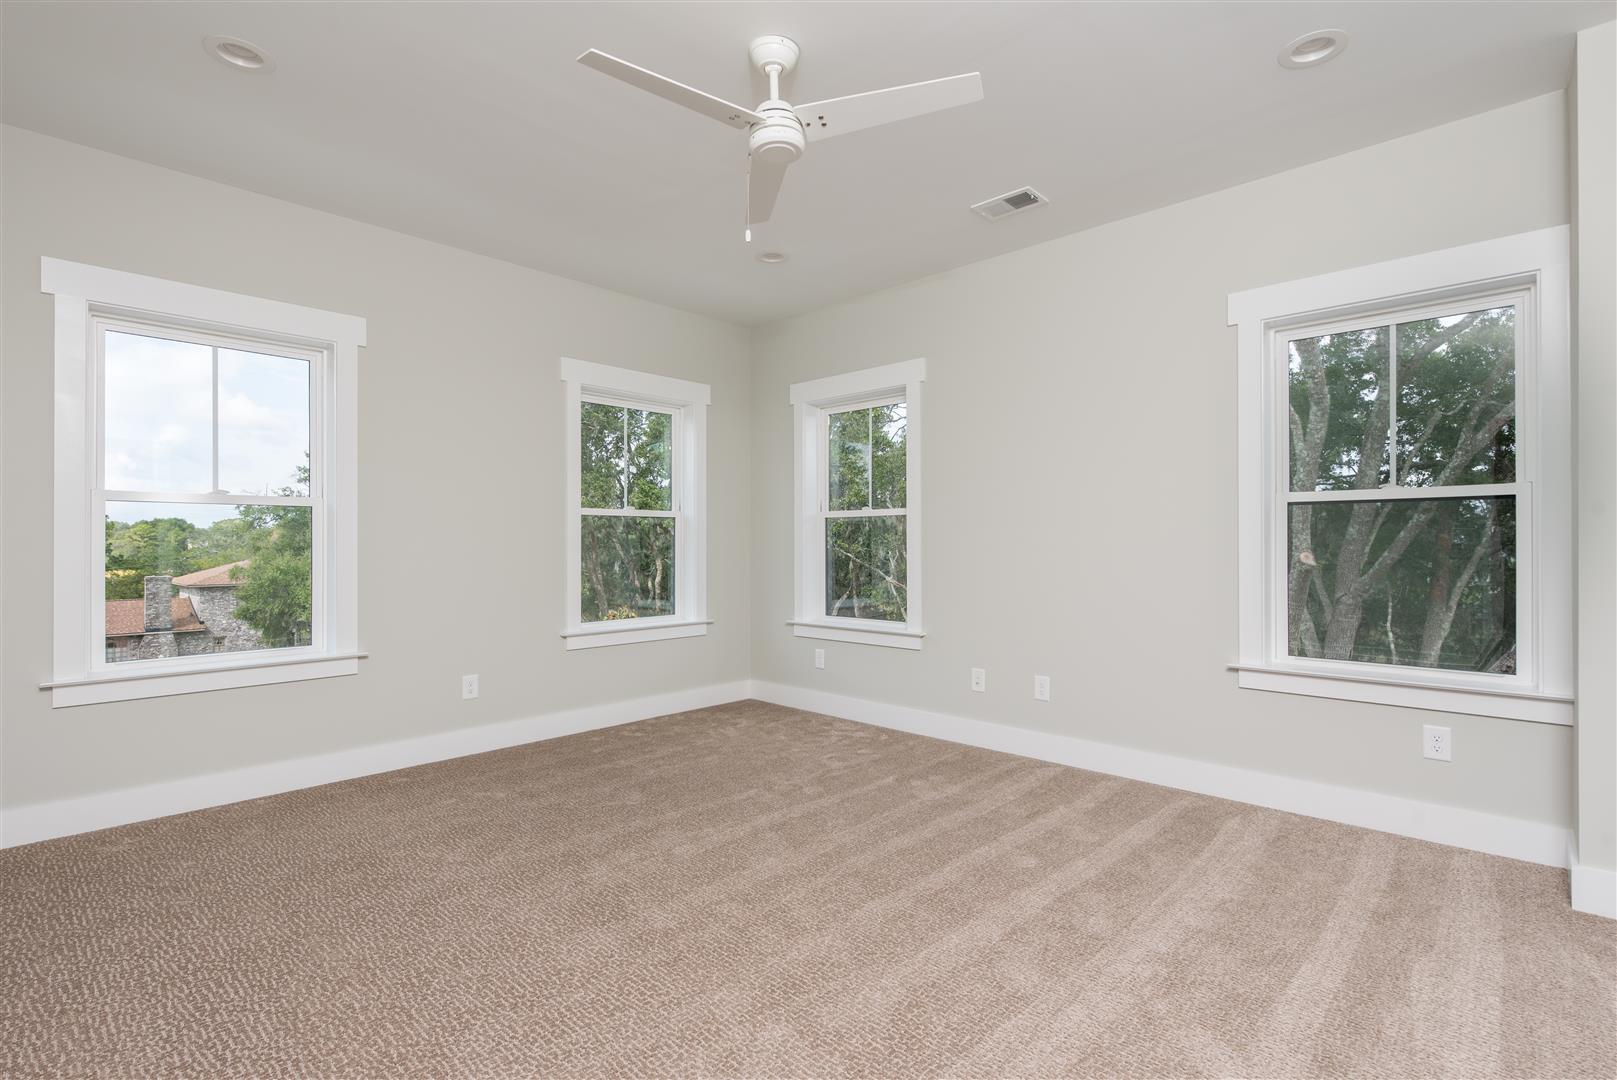 Scanlonville Homes For Sale - 160 5th, Mount Pleasant, SC - 19